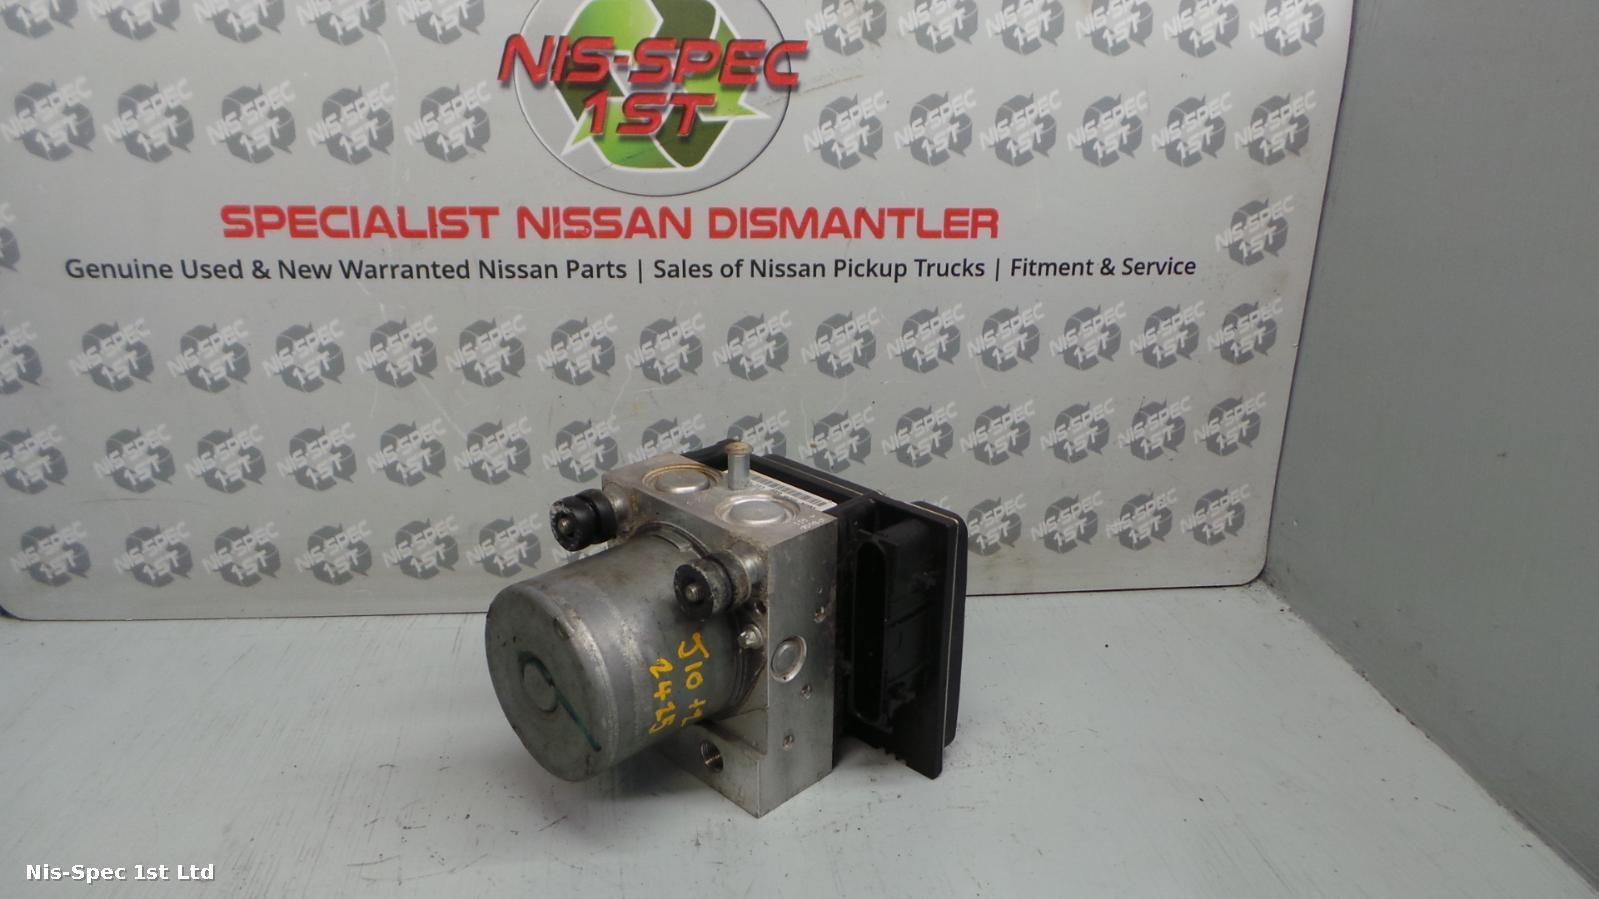 QASHQAI ABS PUMP J10 06-13 1.5 DIESEL PART NUMBER 47660 BR00C